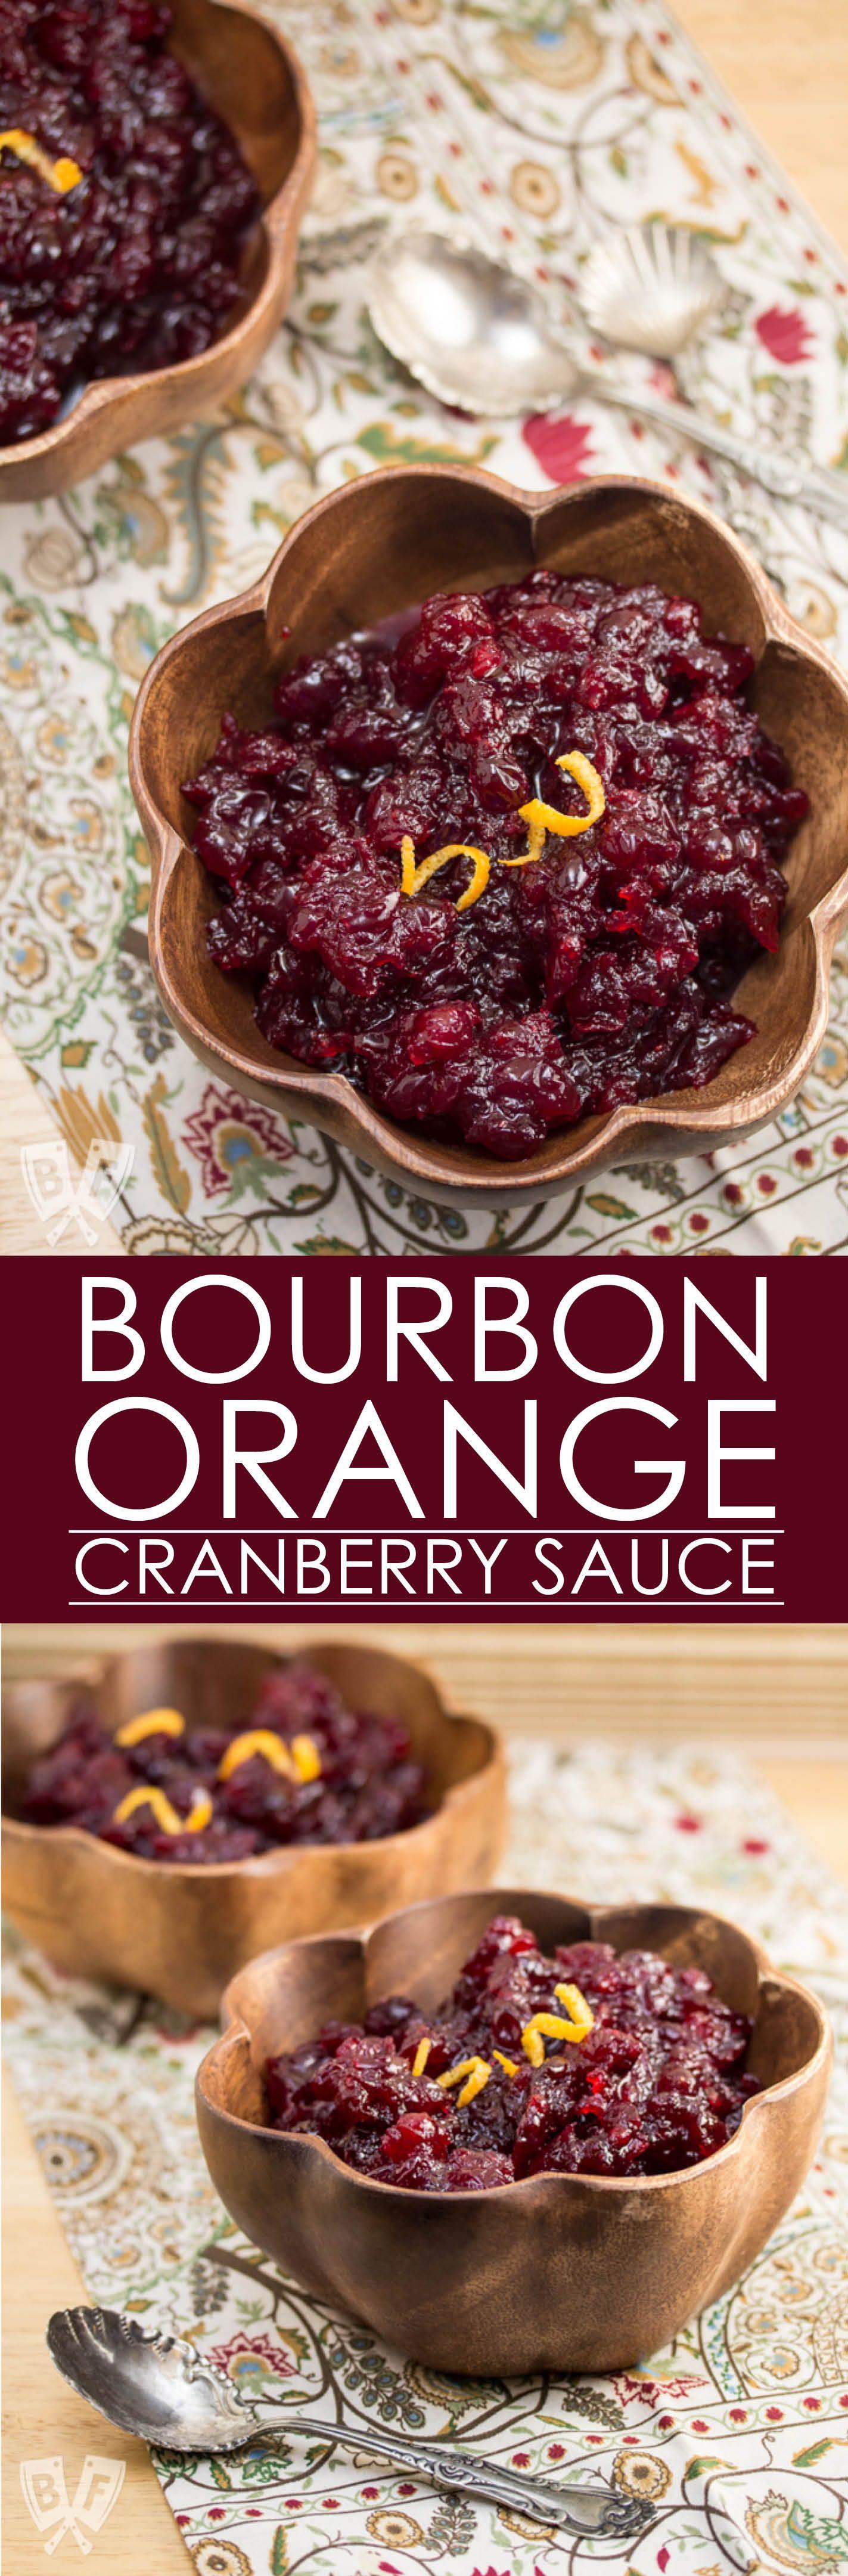 BourbonOrange Cranberry Sauce Recipe Holiday recipes